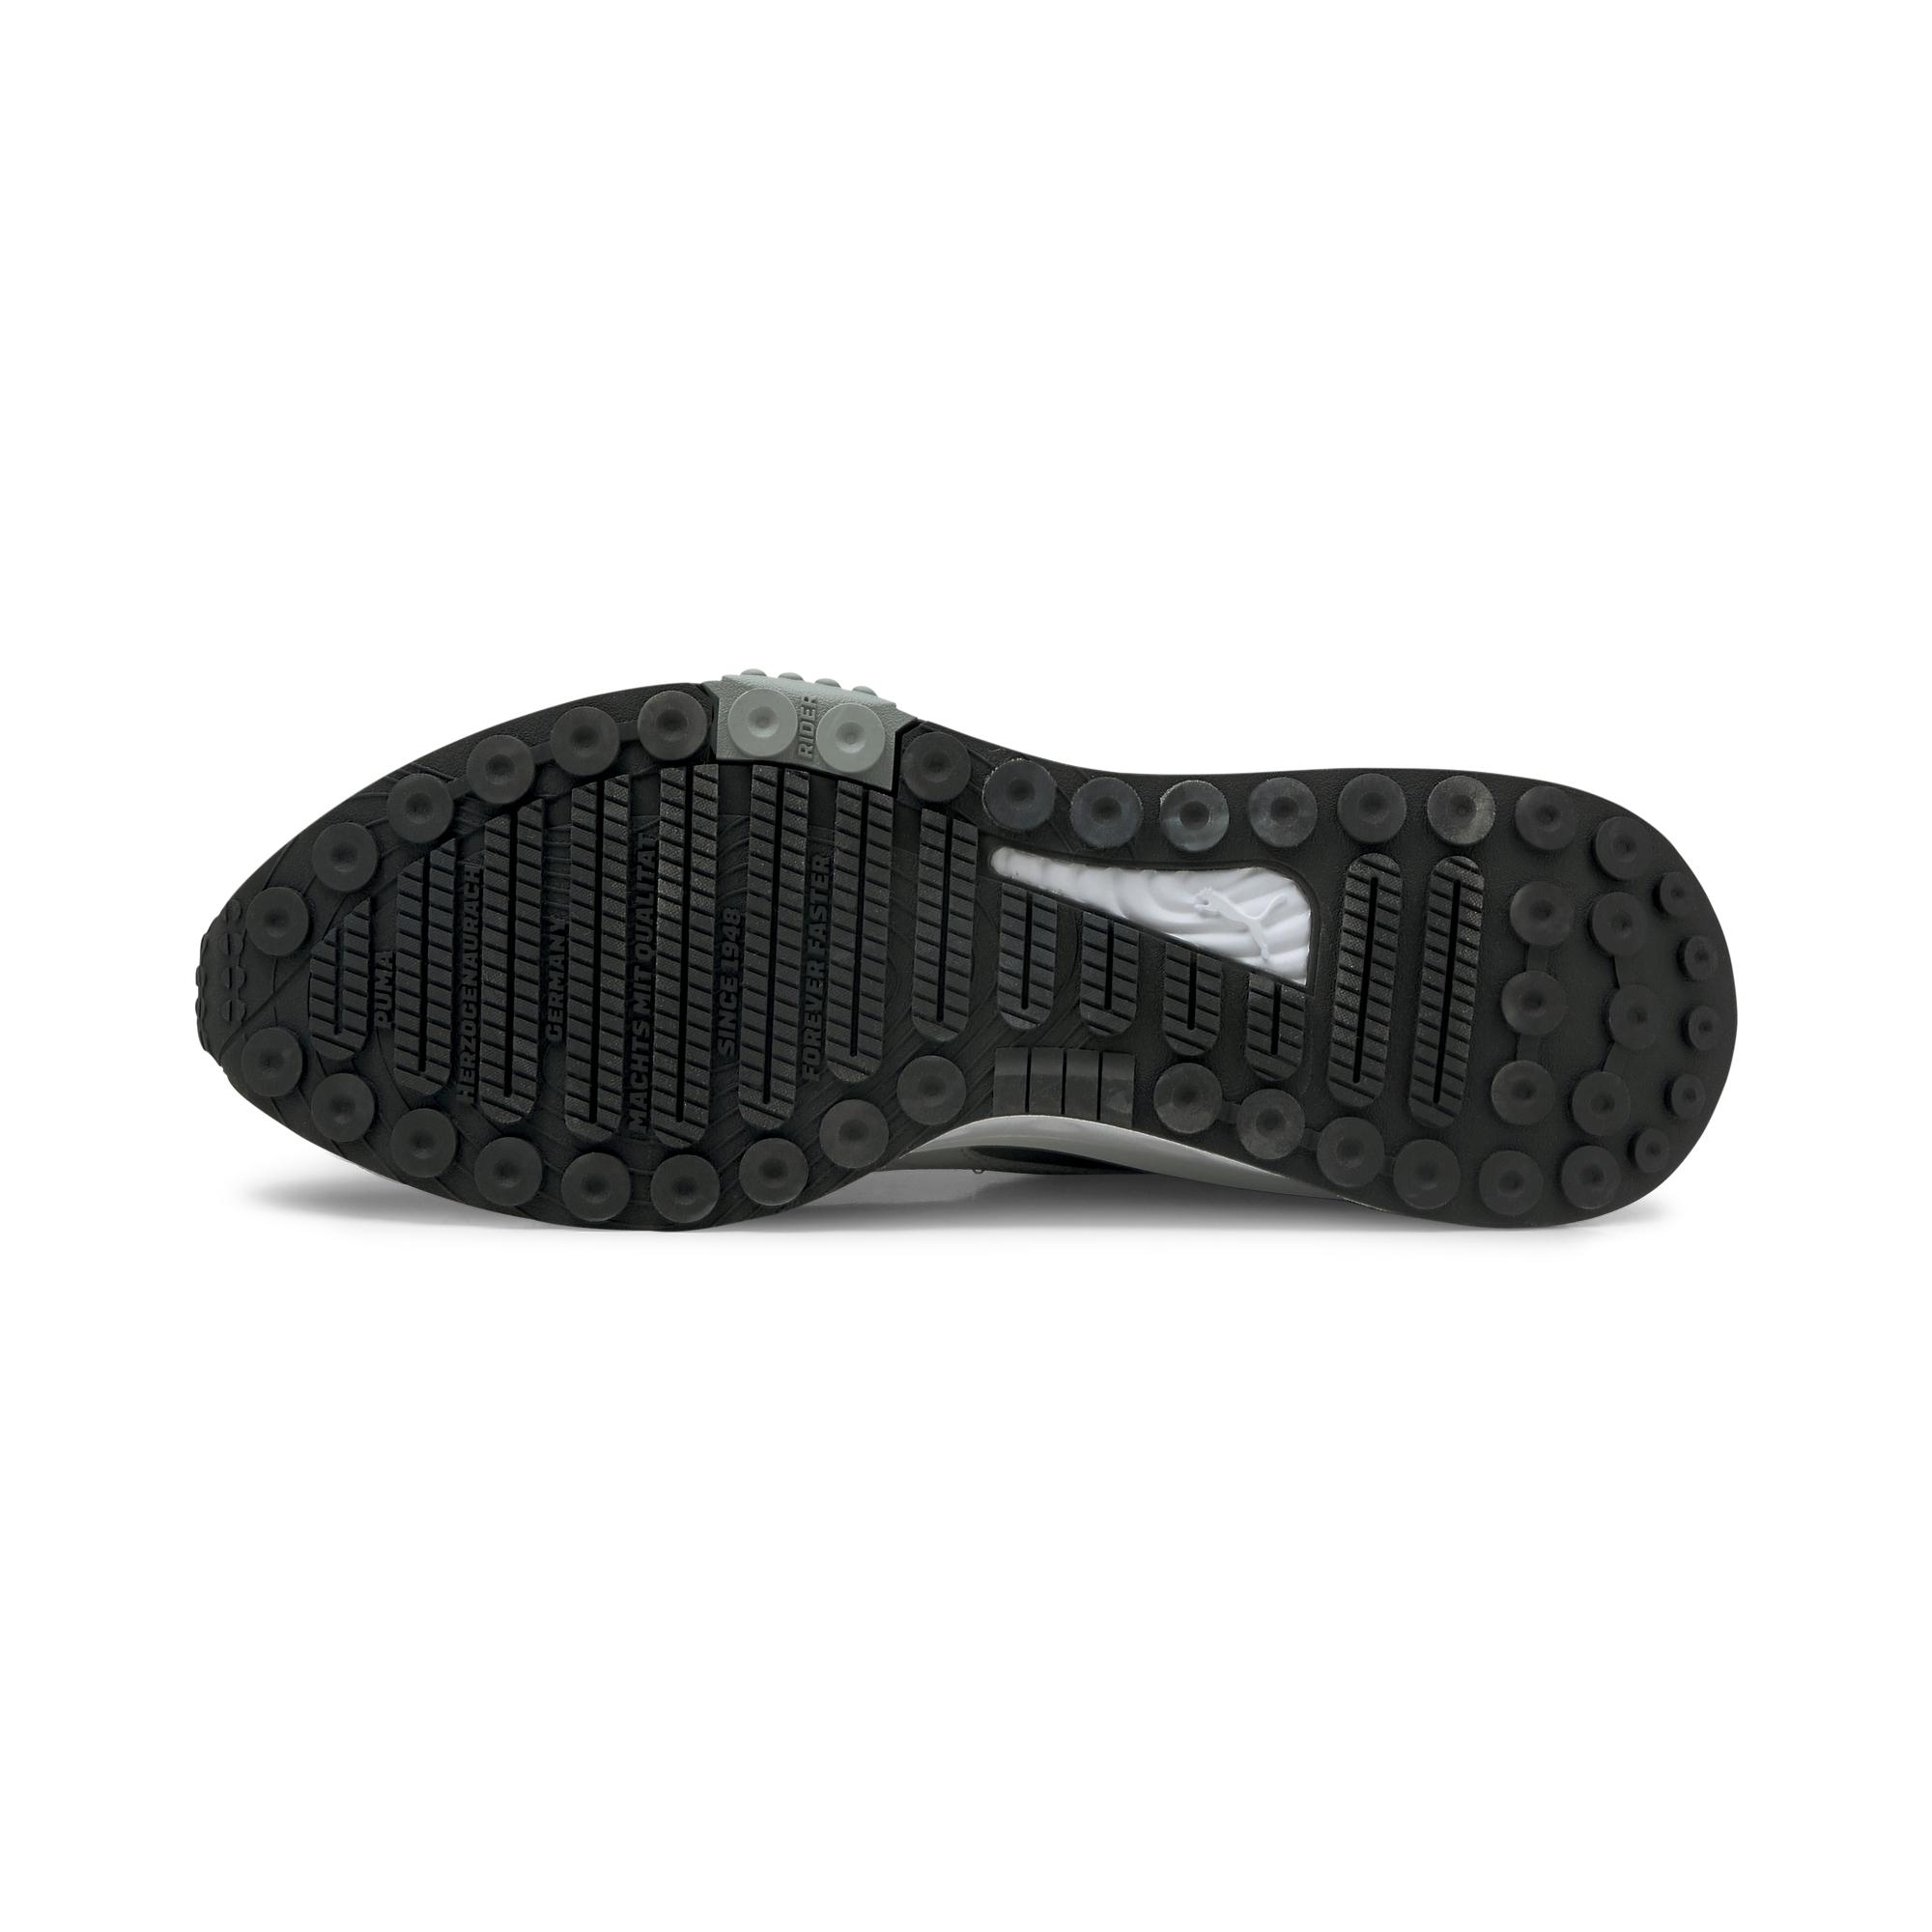 Puma Wild Rider Rollin' sneakers, black, 43